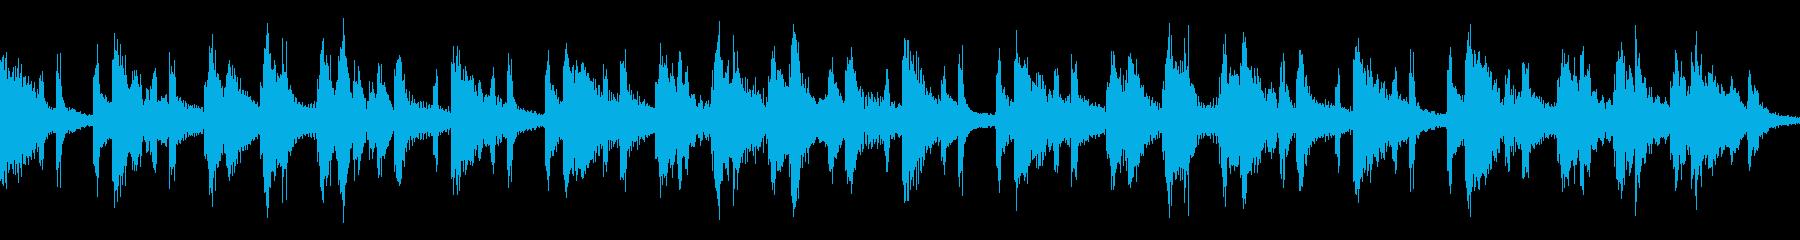 【loop】陽気で呑気なポップスの再生済みの波形